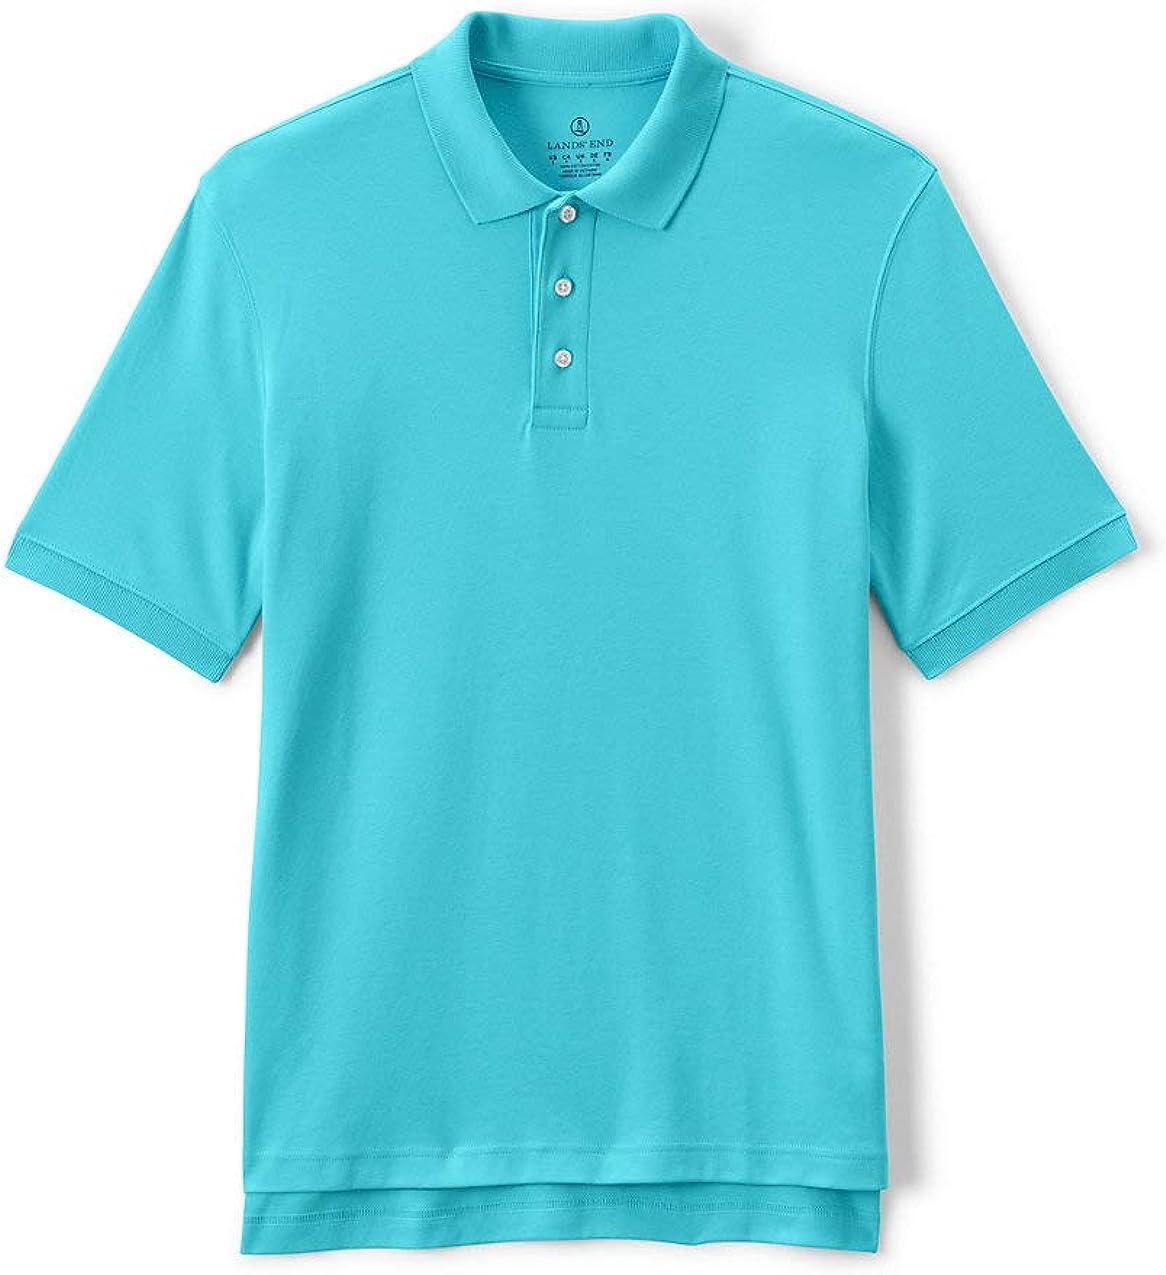 Lands' End School Uniform Men's Short Sleeve Interlock Polo Shirt